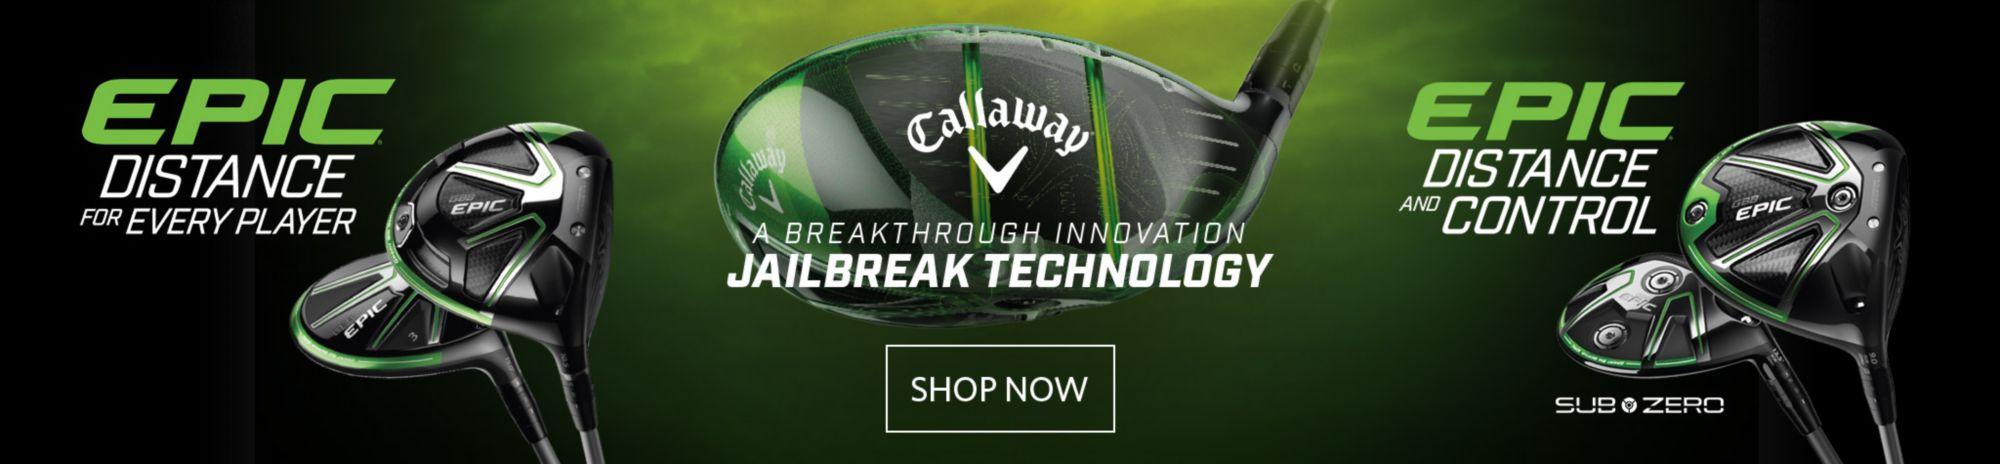 Callawy Epic Launch